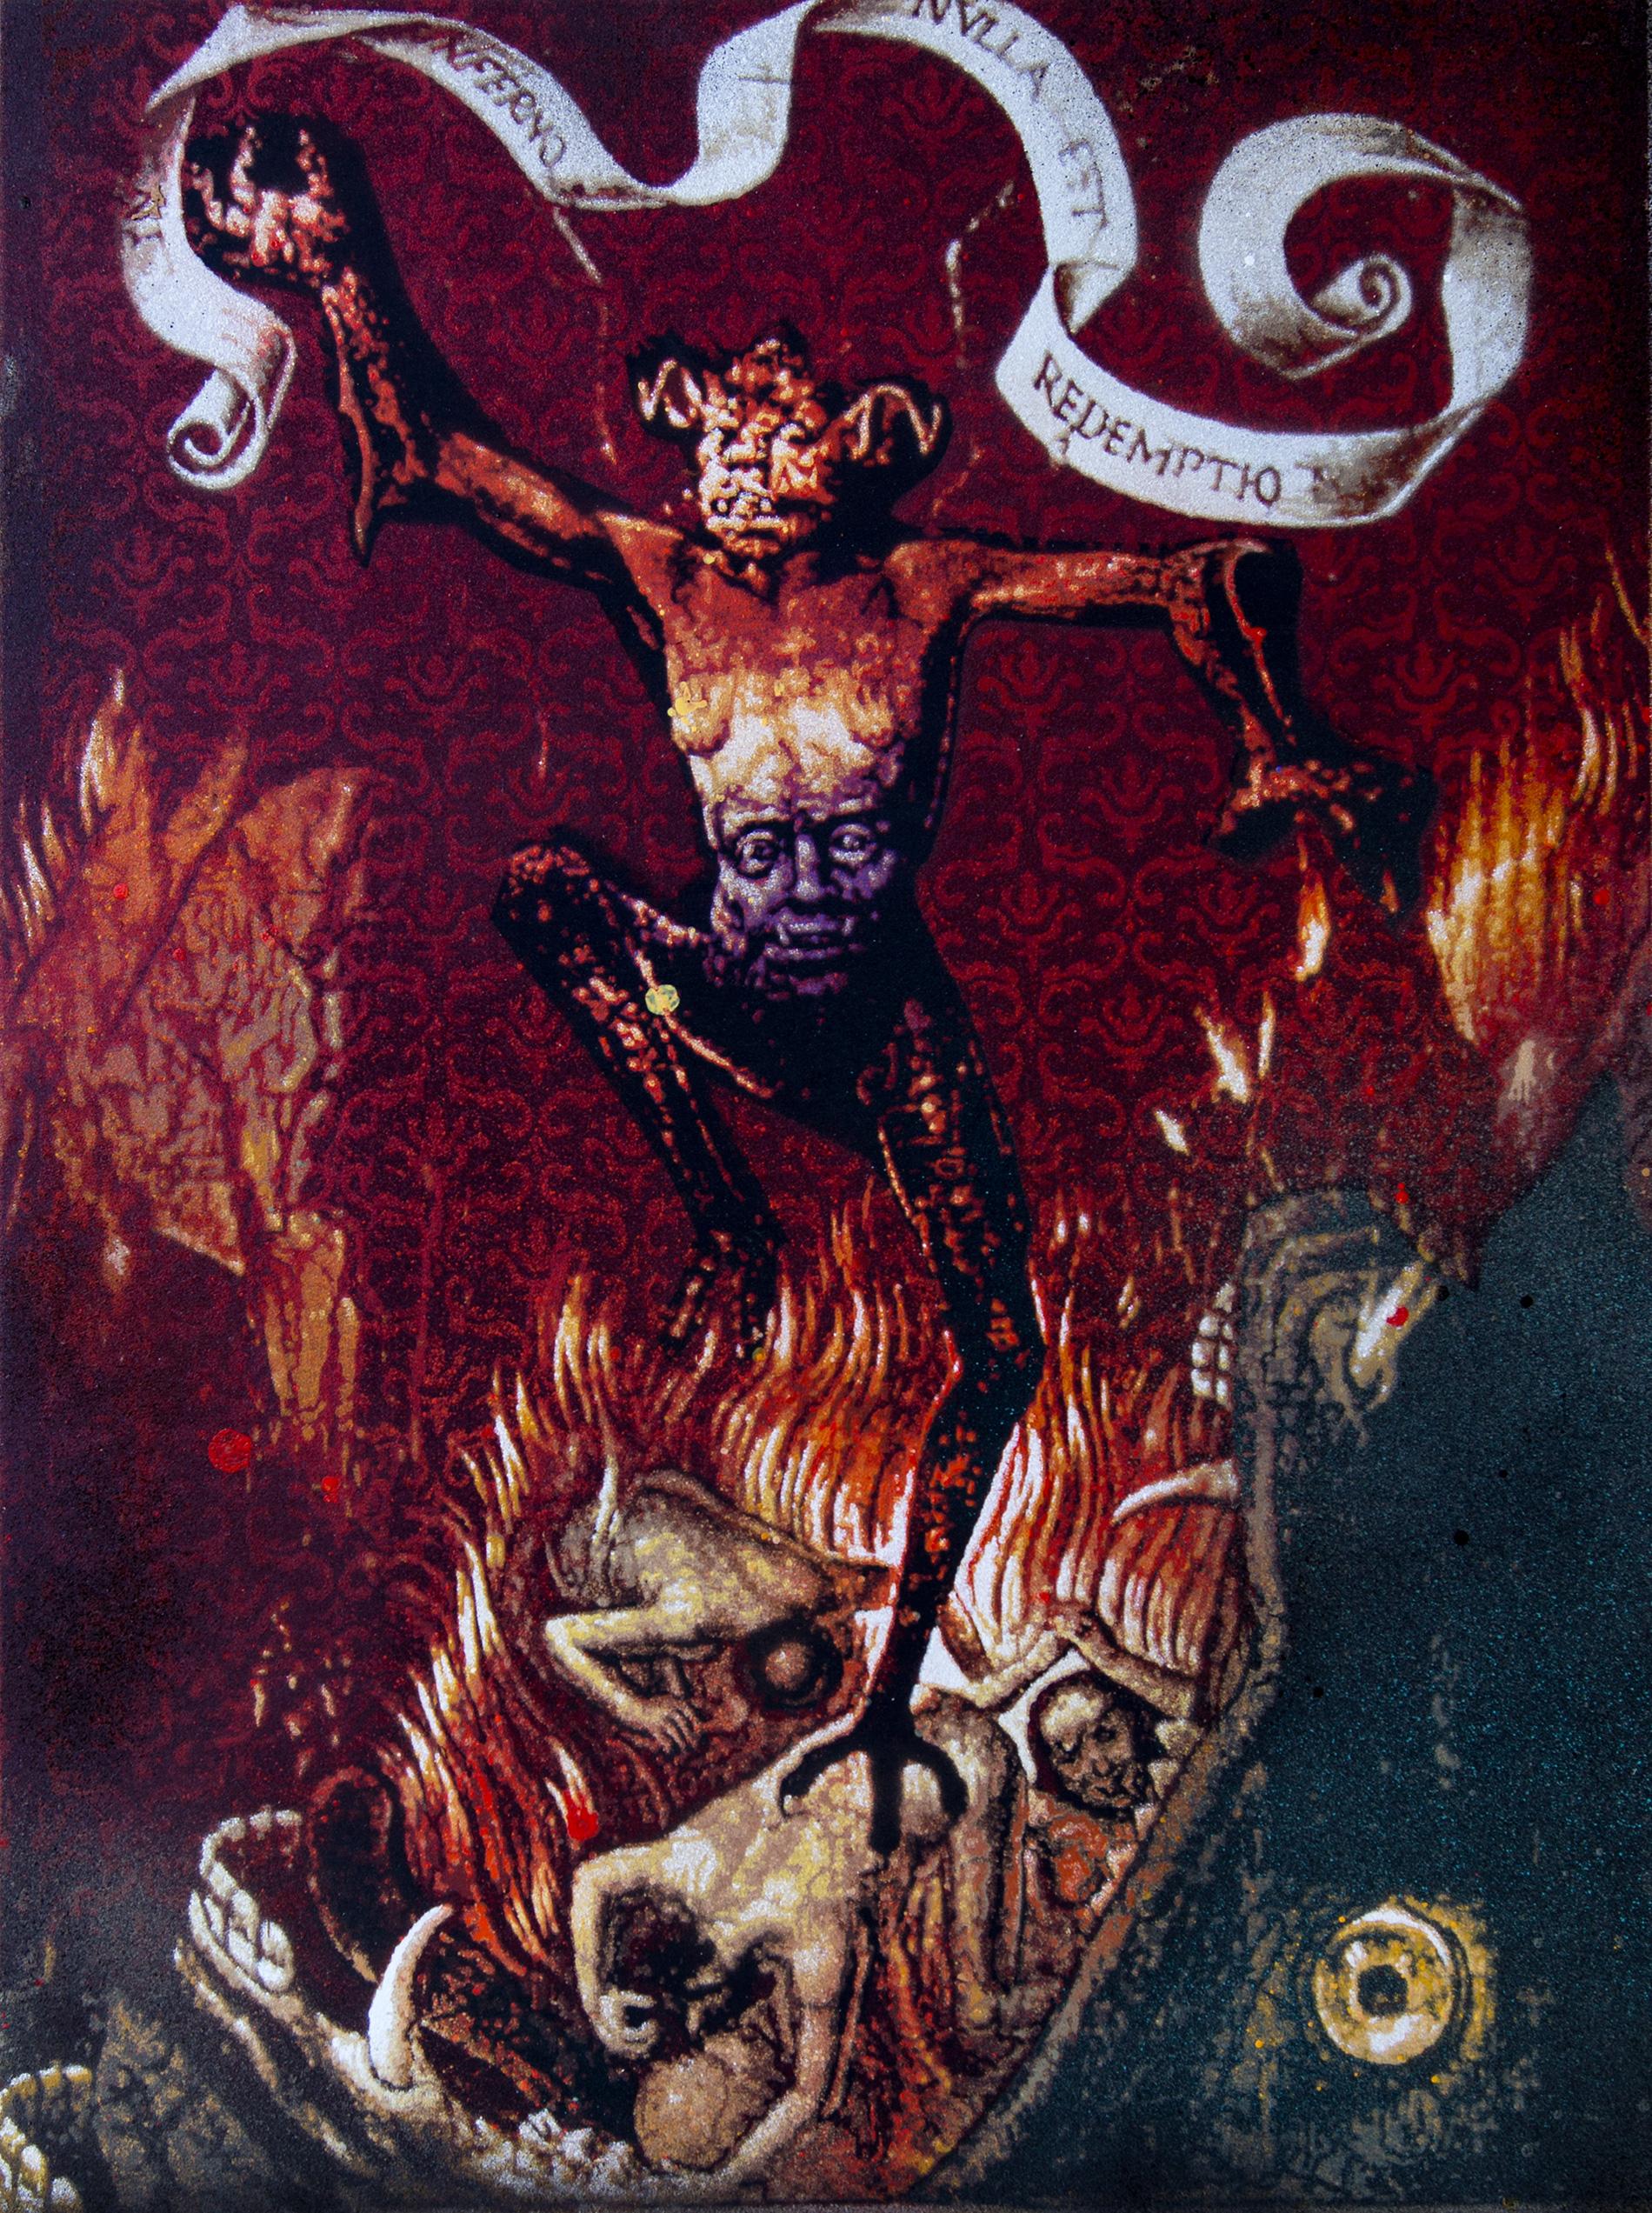 2015-18X24-HANS-MEMLING-EARTHY.VANITY.AND-DIVINE-SALVATION--DEVIL